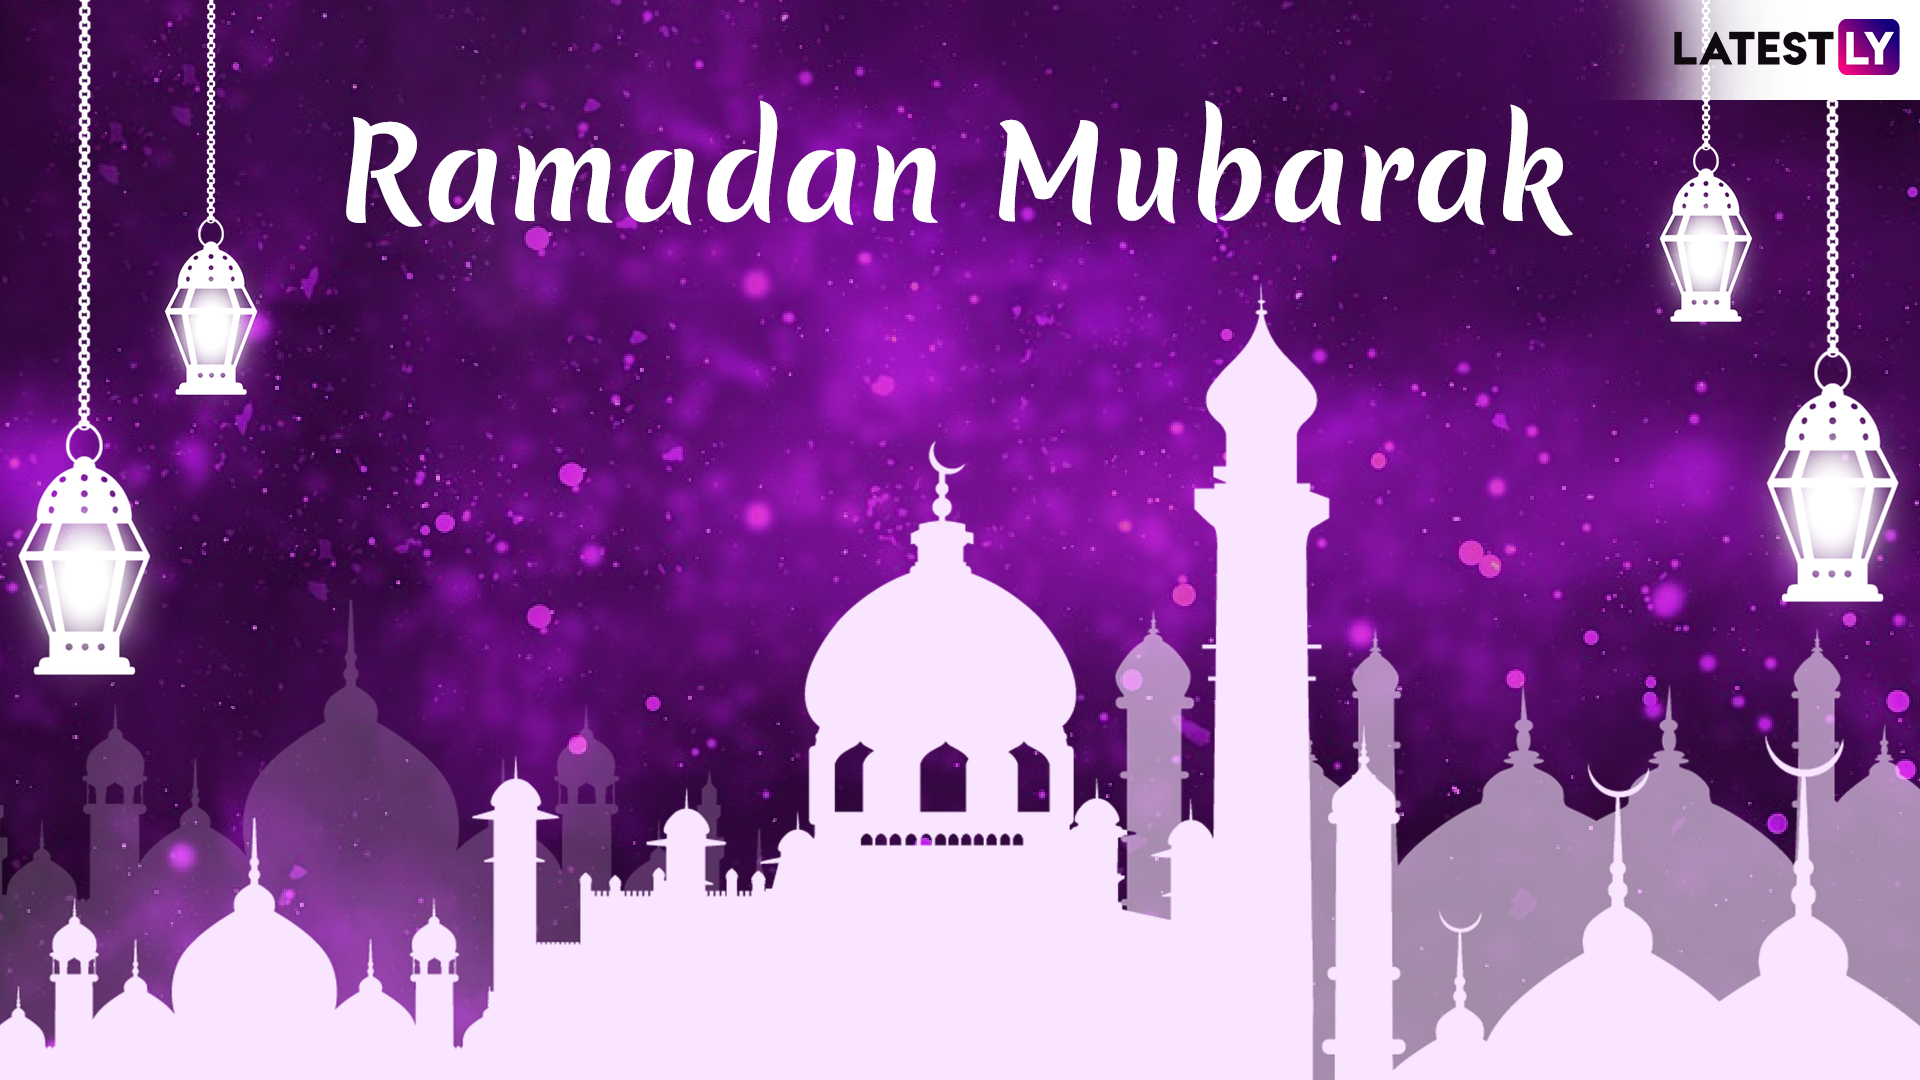 Ramadan mubarak shayari 2019 ramzan messages image greetings and wishes to send during the upcoming muslims festive season